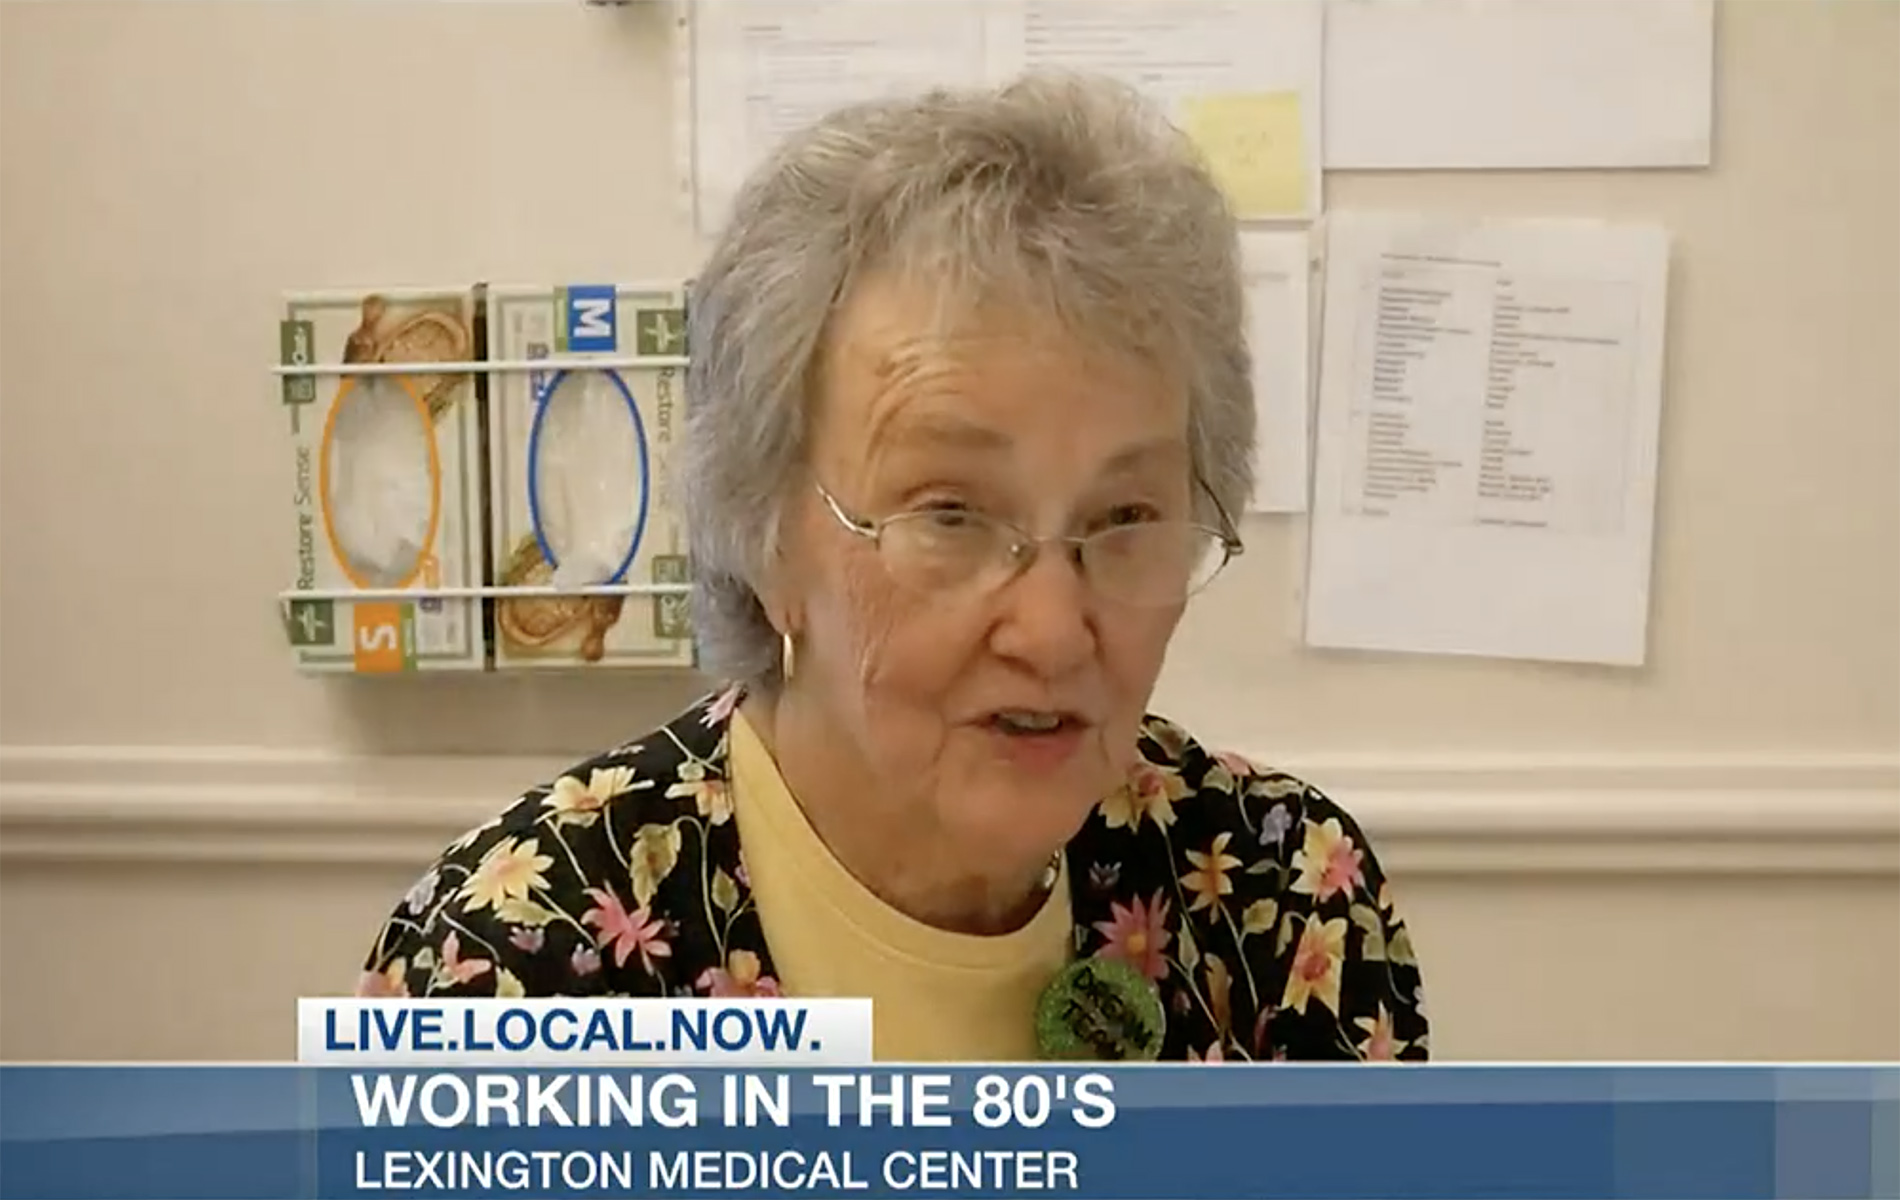 Fannie Ward interviewed at Lexington Medical Center